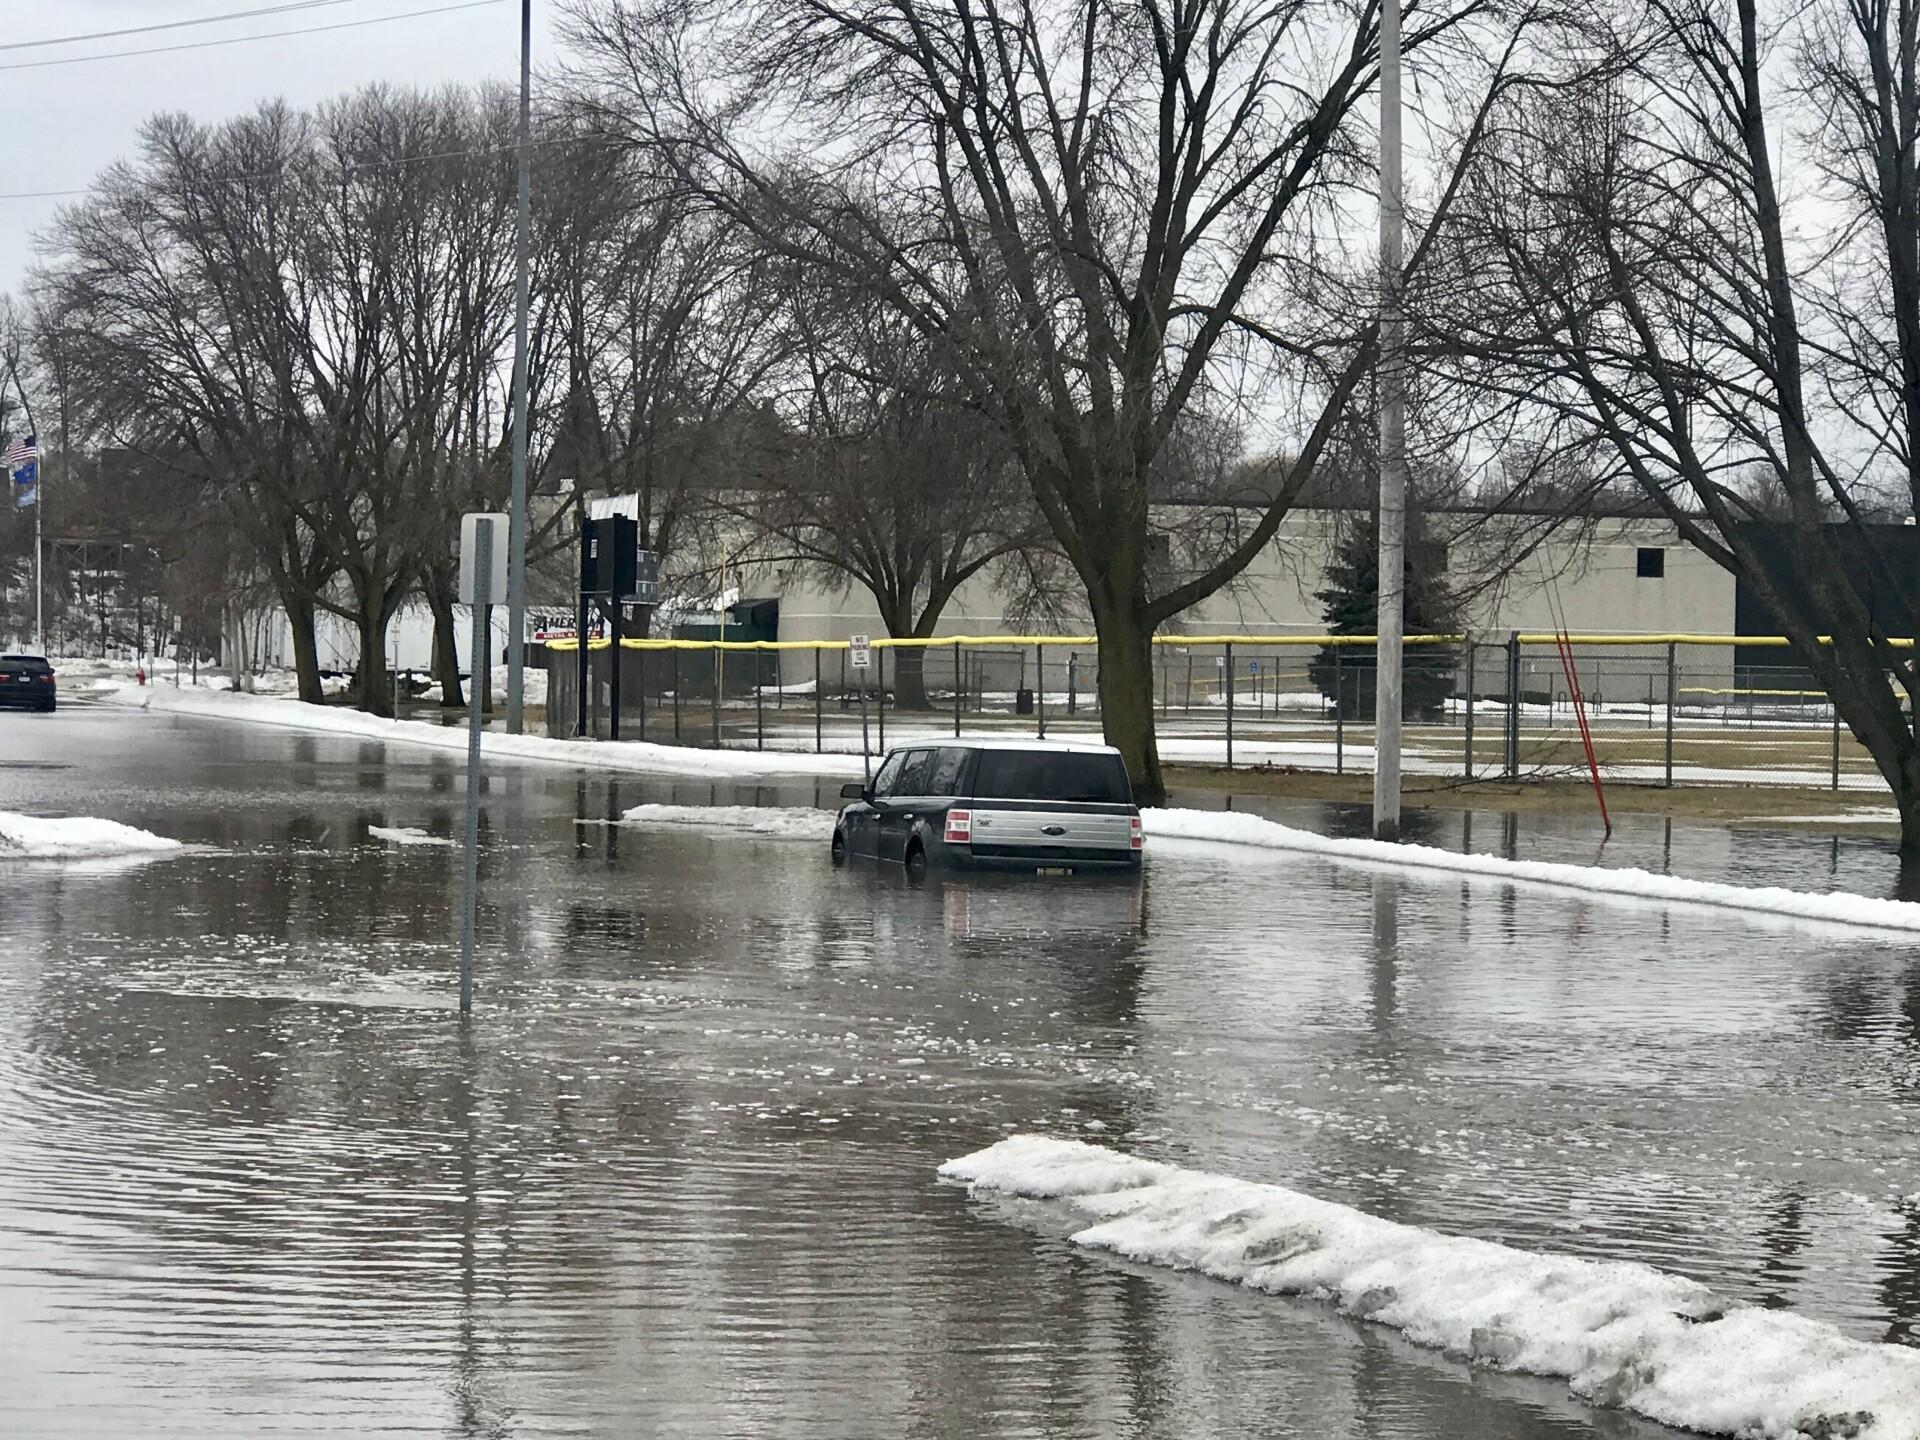 Car stuck in Sheboygan flooding